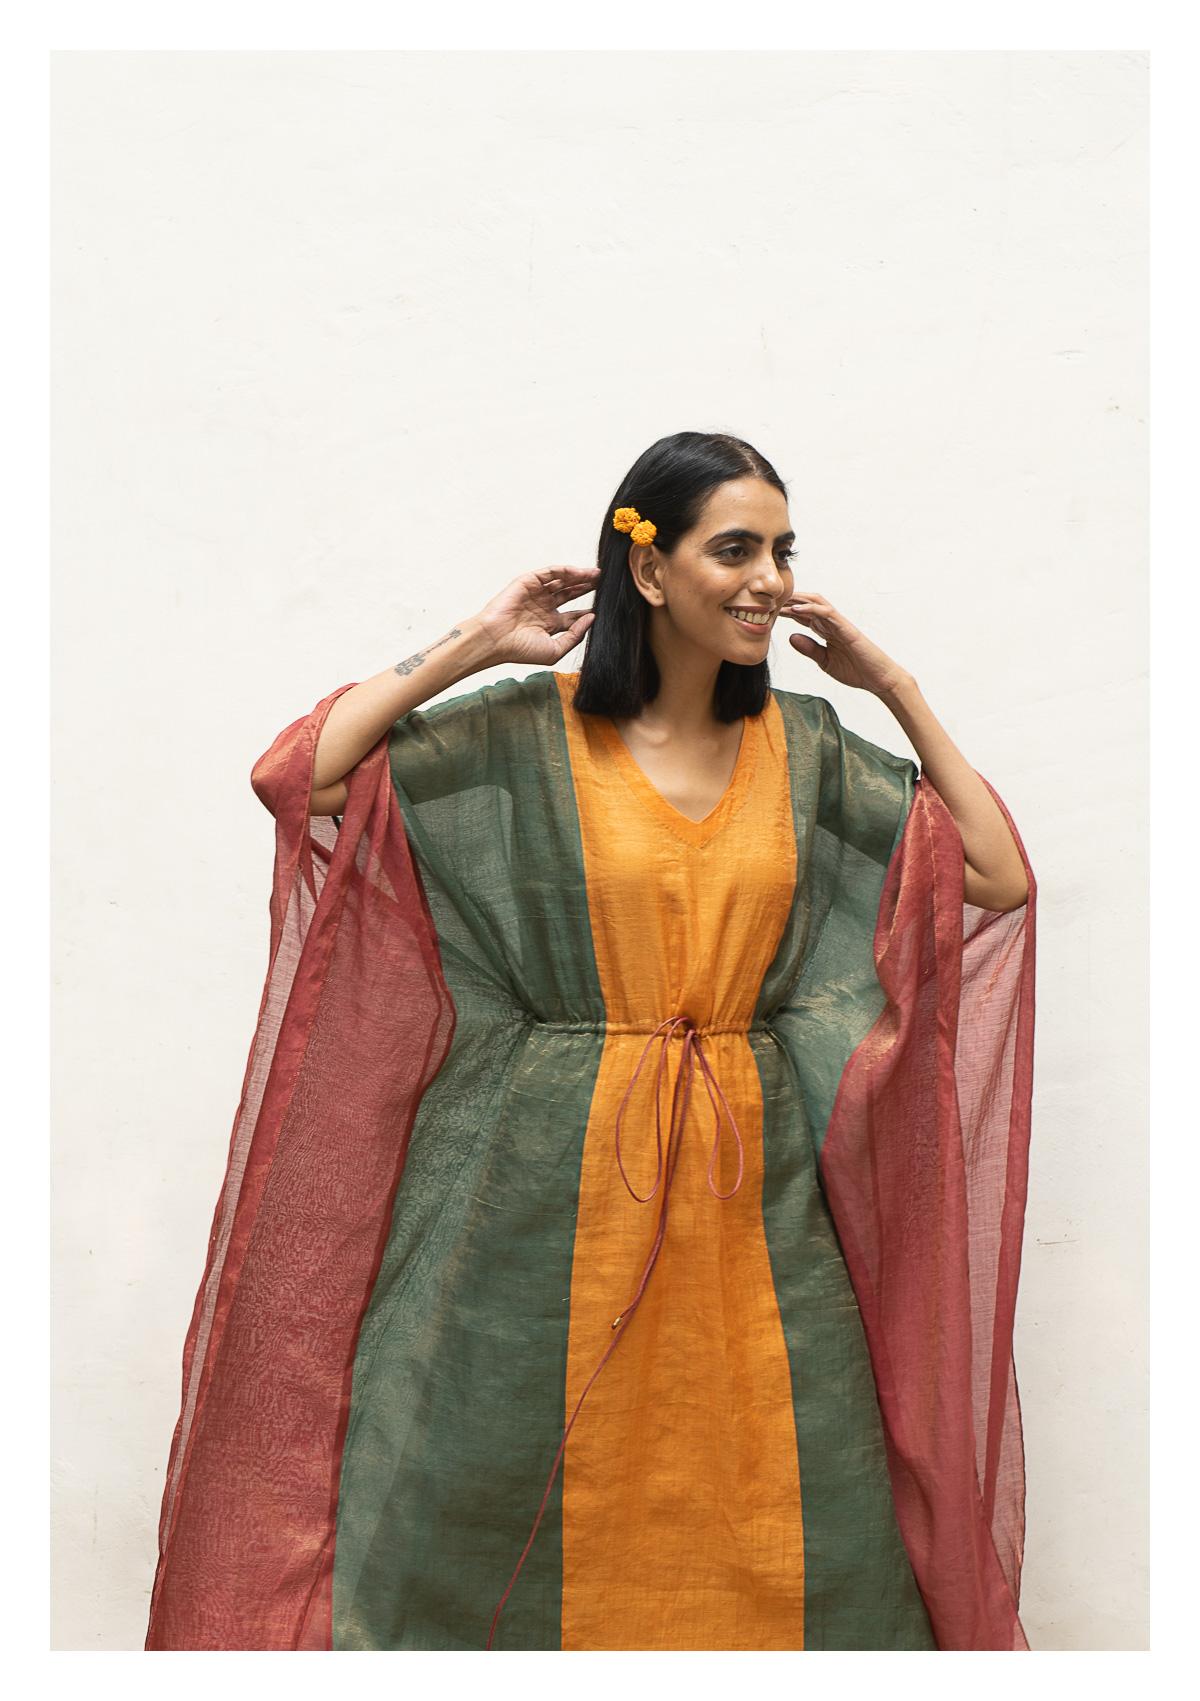 Basho Multicolored Tissue Chanderi Kaftaan Pant Set